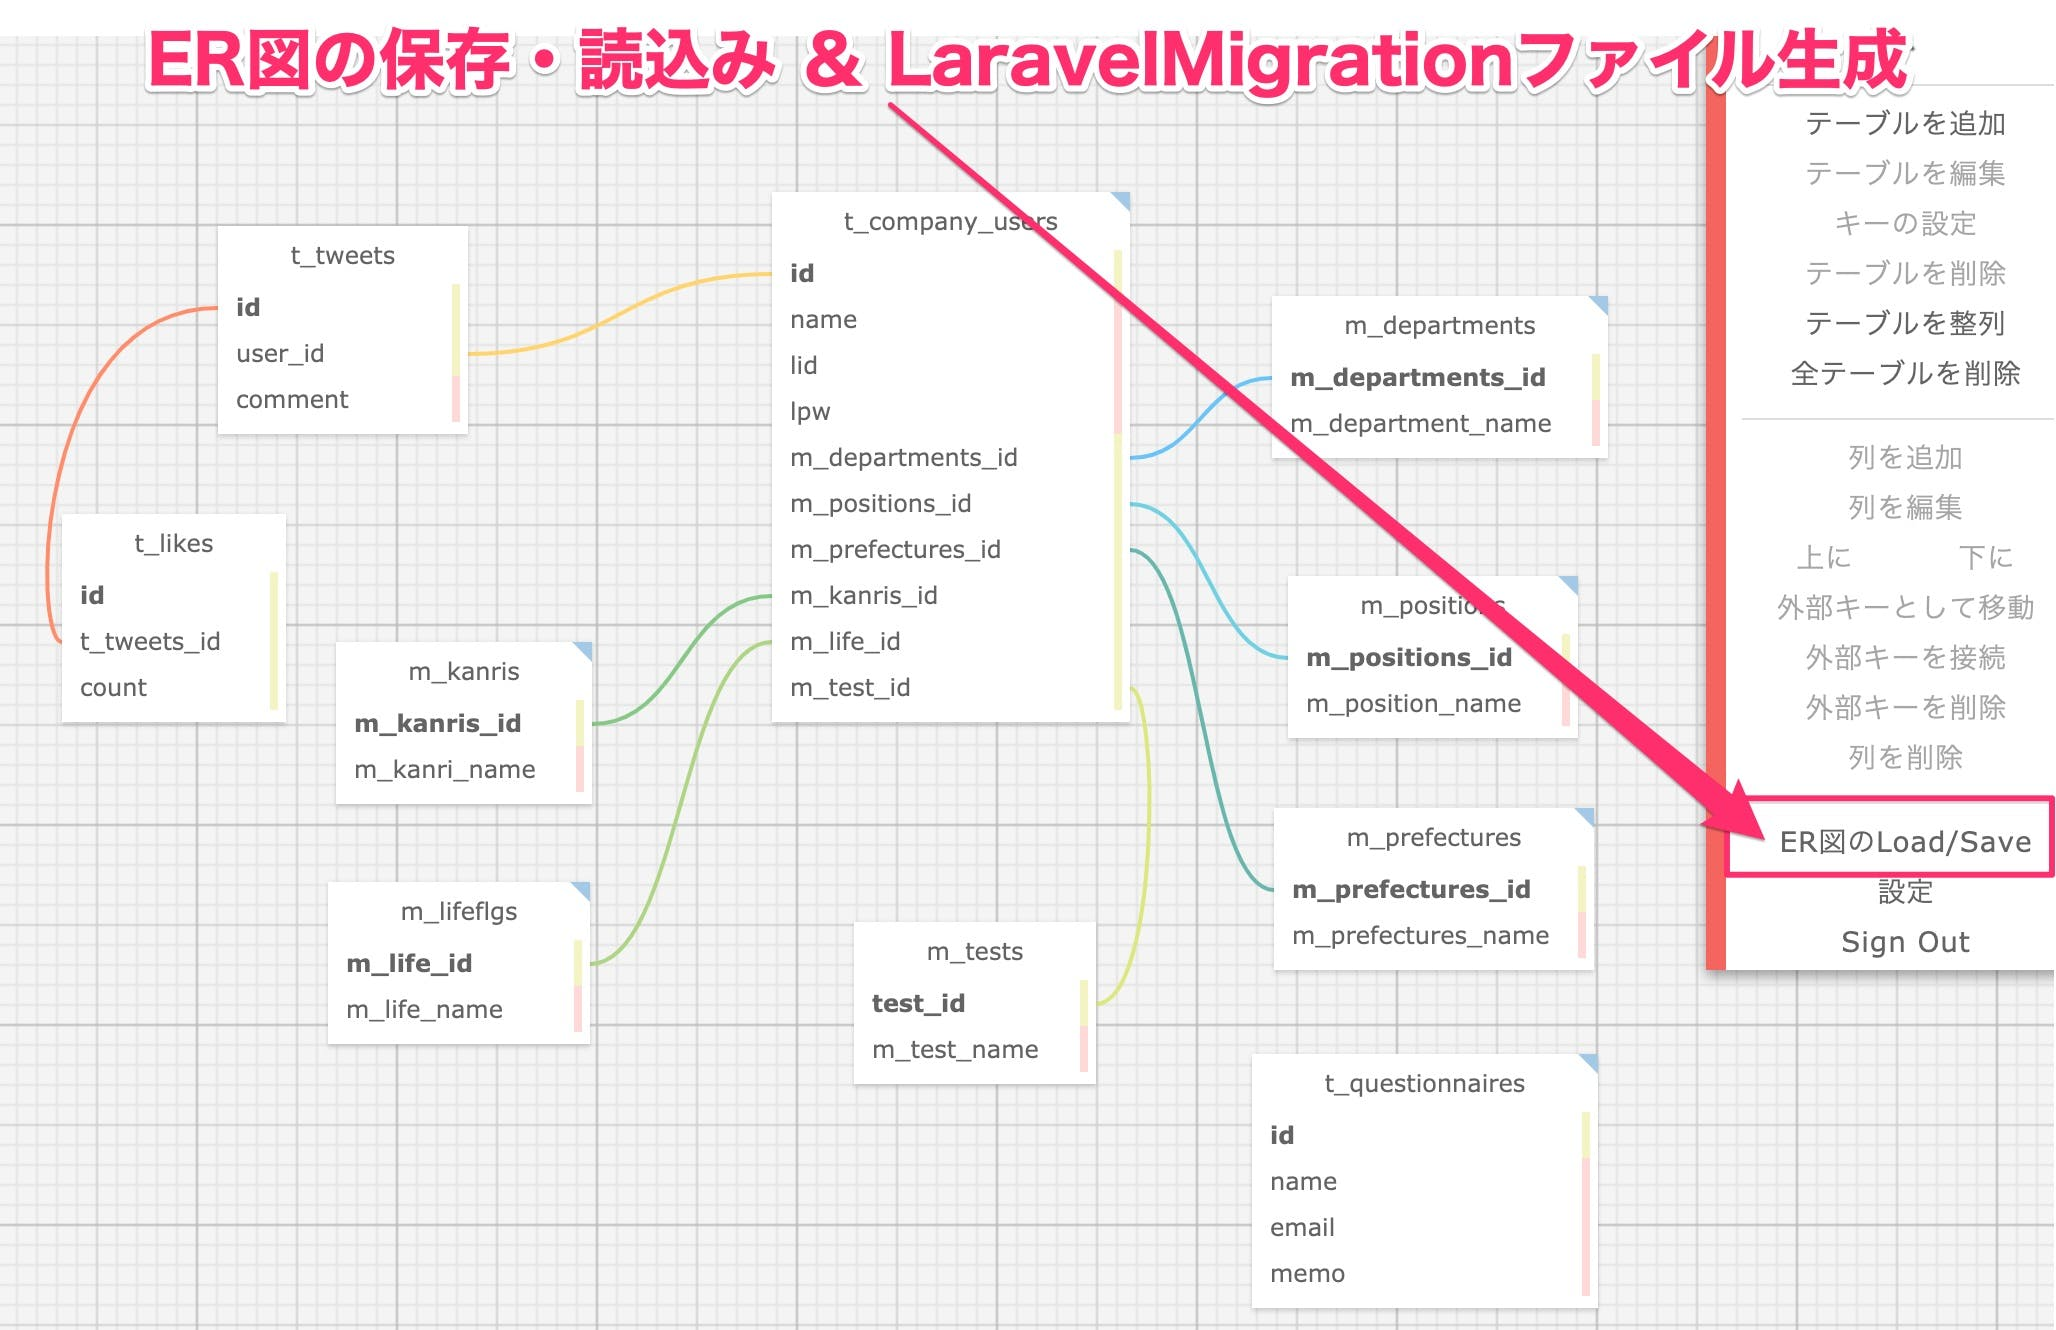 ER_diagram_Quick.jpg